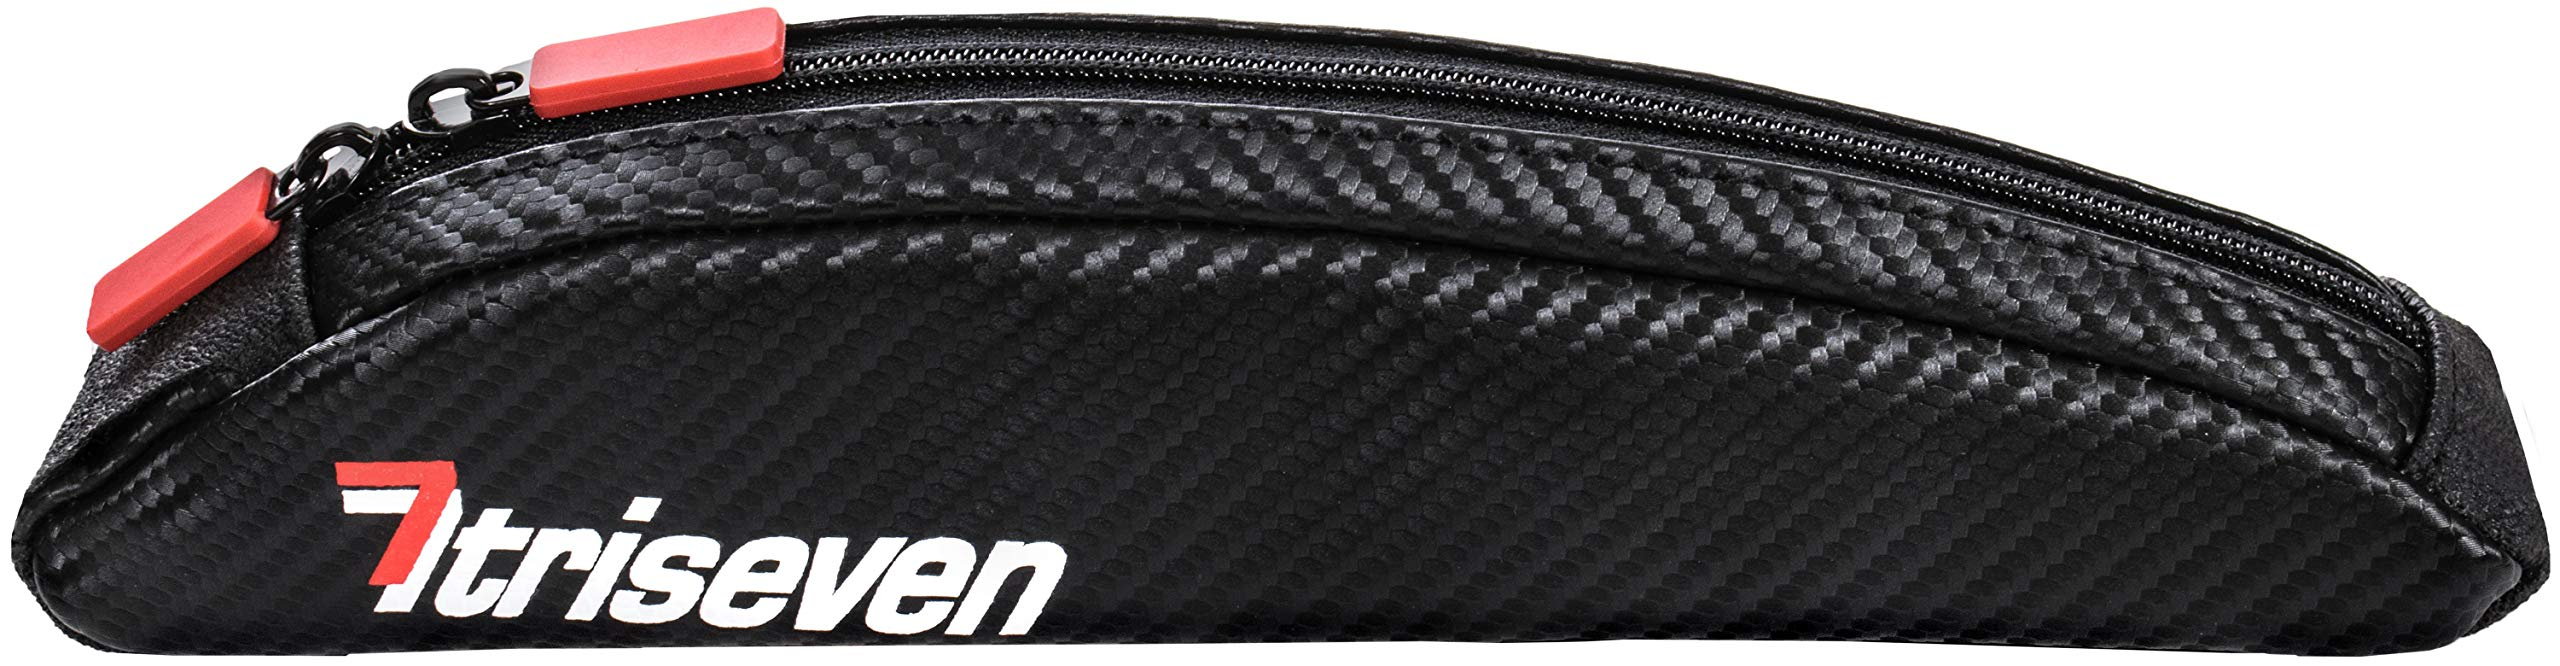 TriSeven Aero Bag 10~top Frame Bag~Carbon Design~Lightweight~Easy Mount~Cycling Bag~Waterproof Material~100%